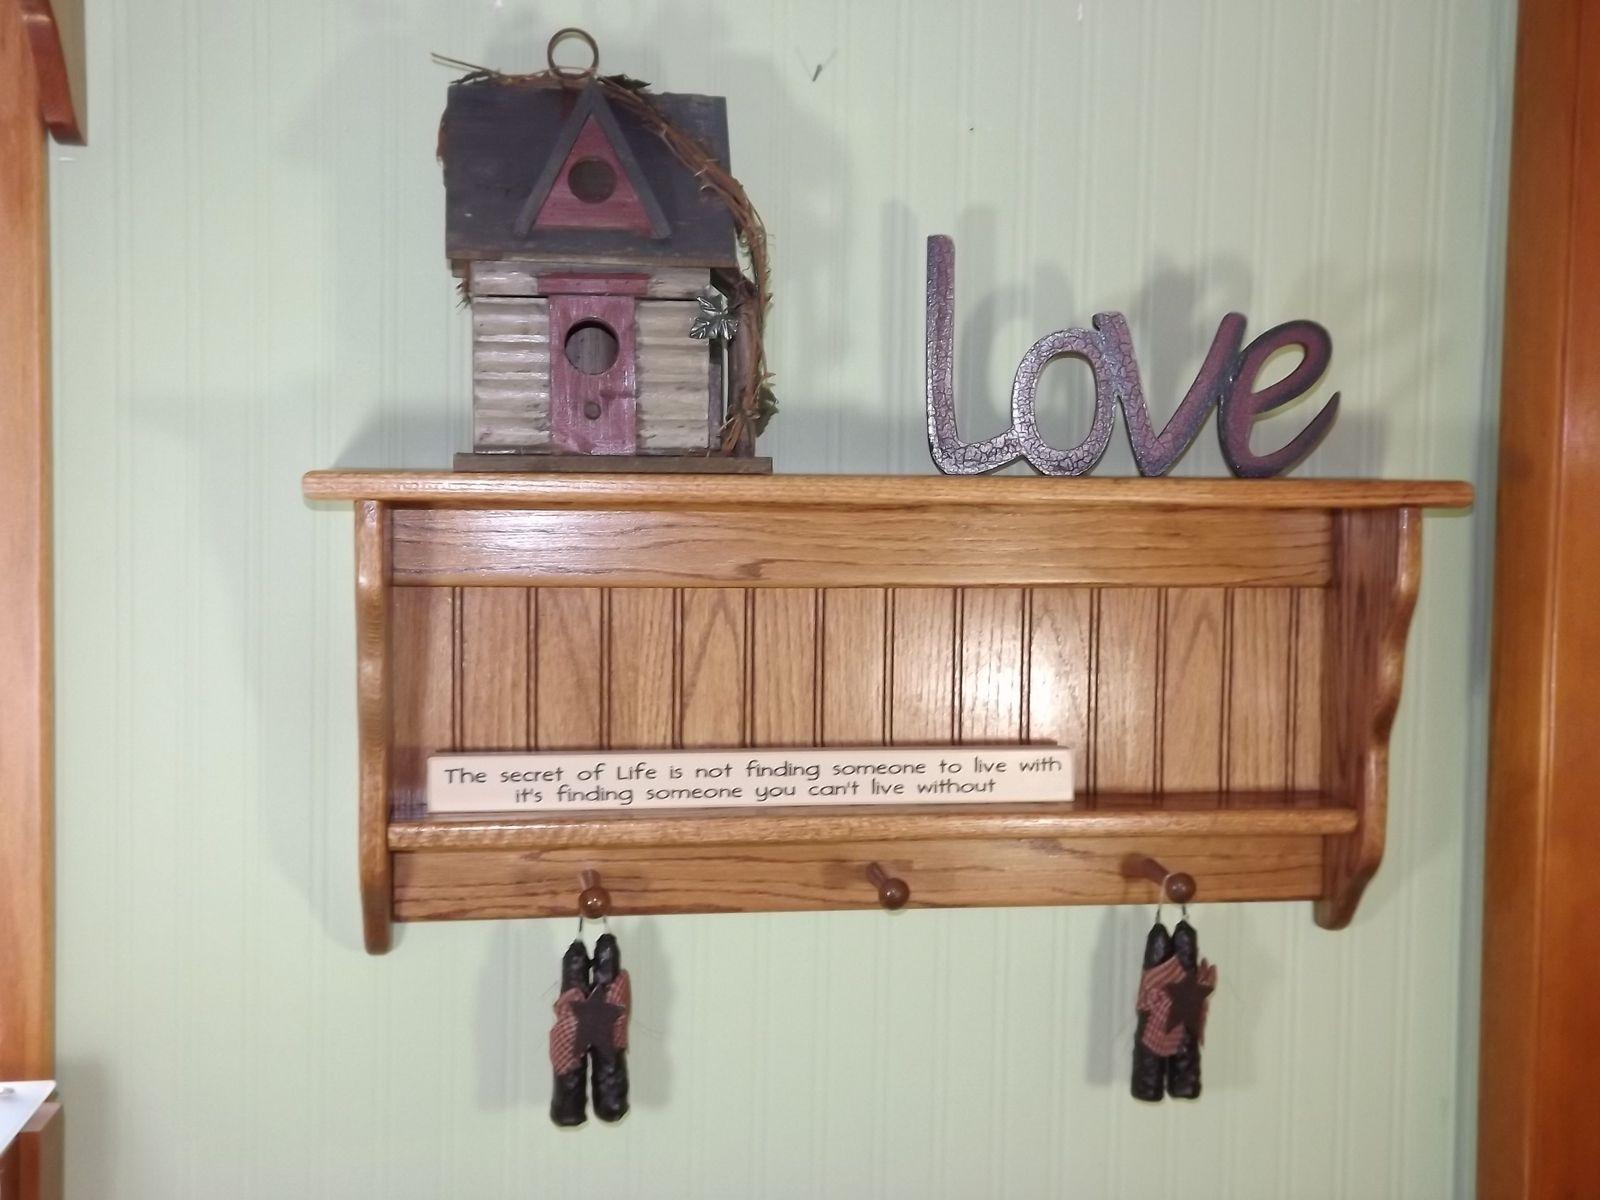 hand made solid oak coat racks wall shelves by appletree woodcrafts gifts. Black Bedroom Furniture Sets. Home Design Ideas